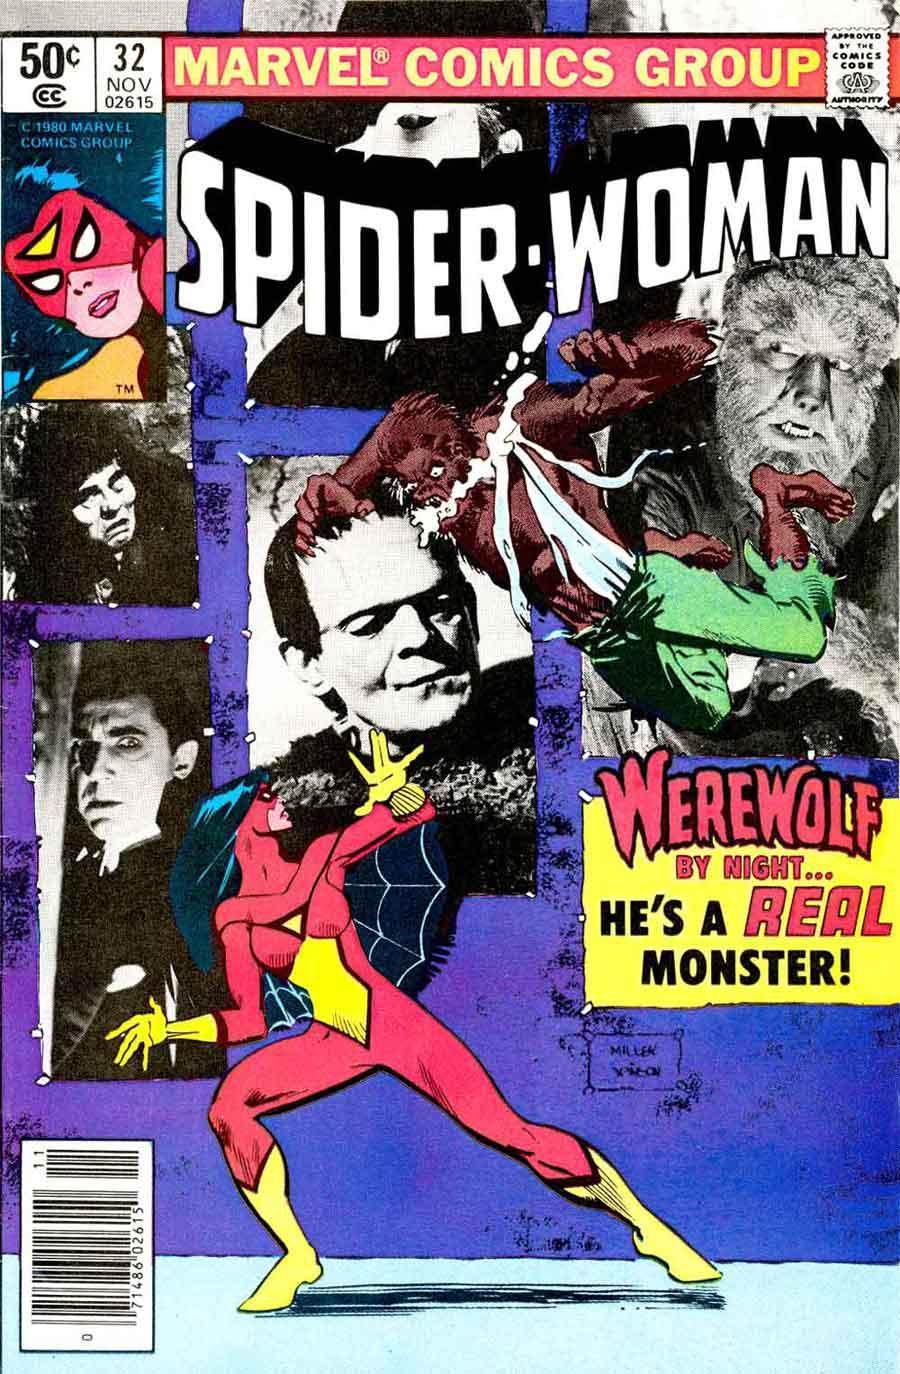 Spider-Woman-v1-32